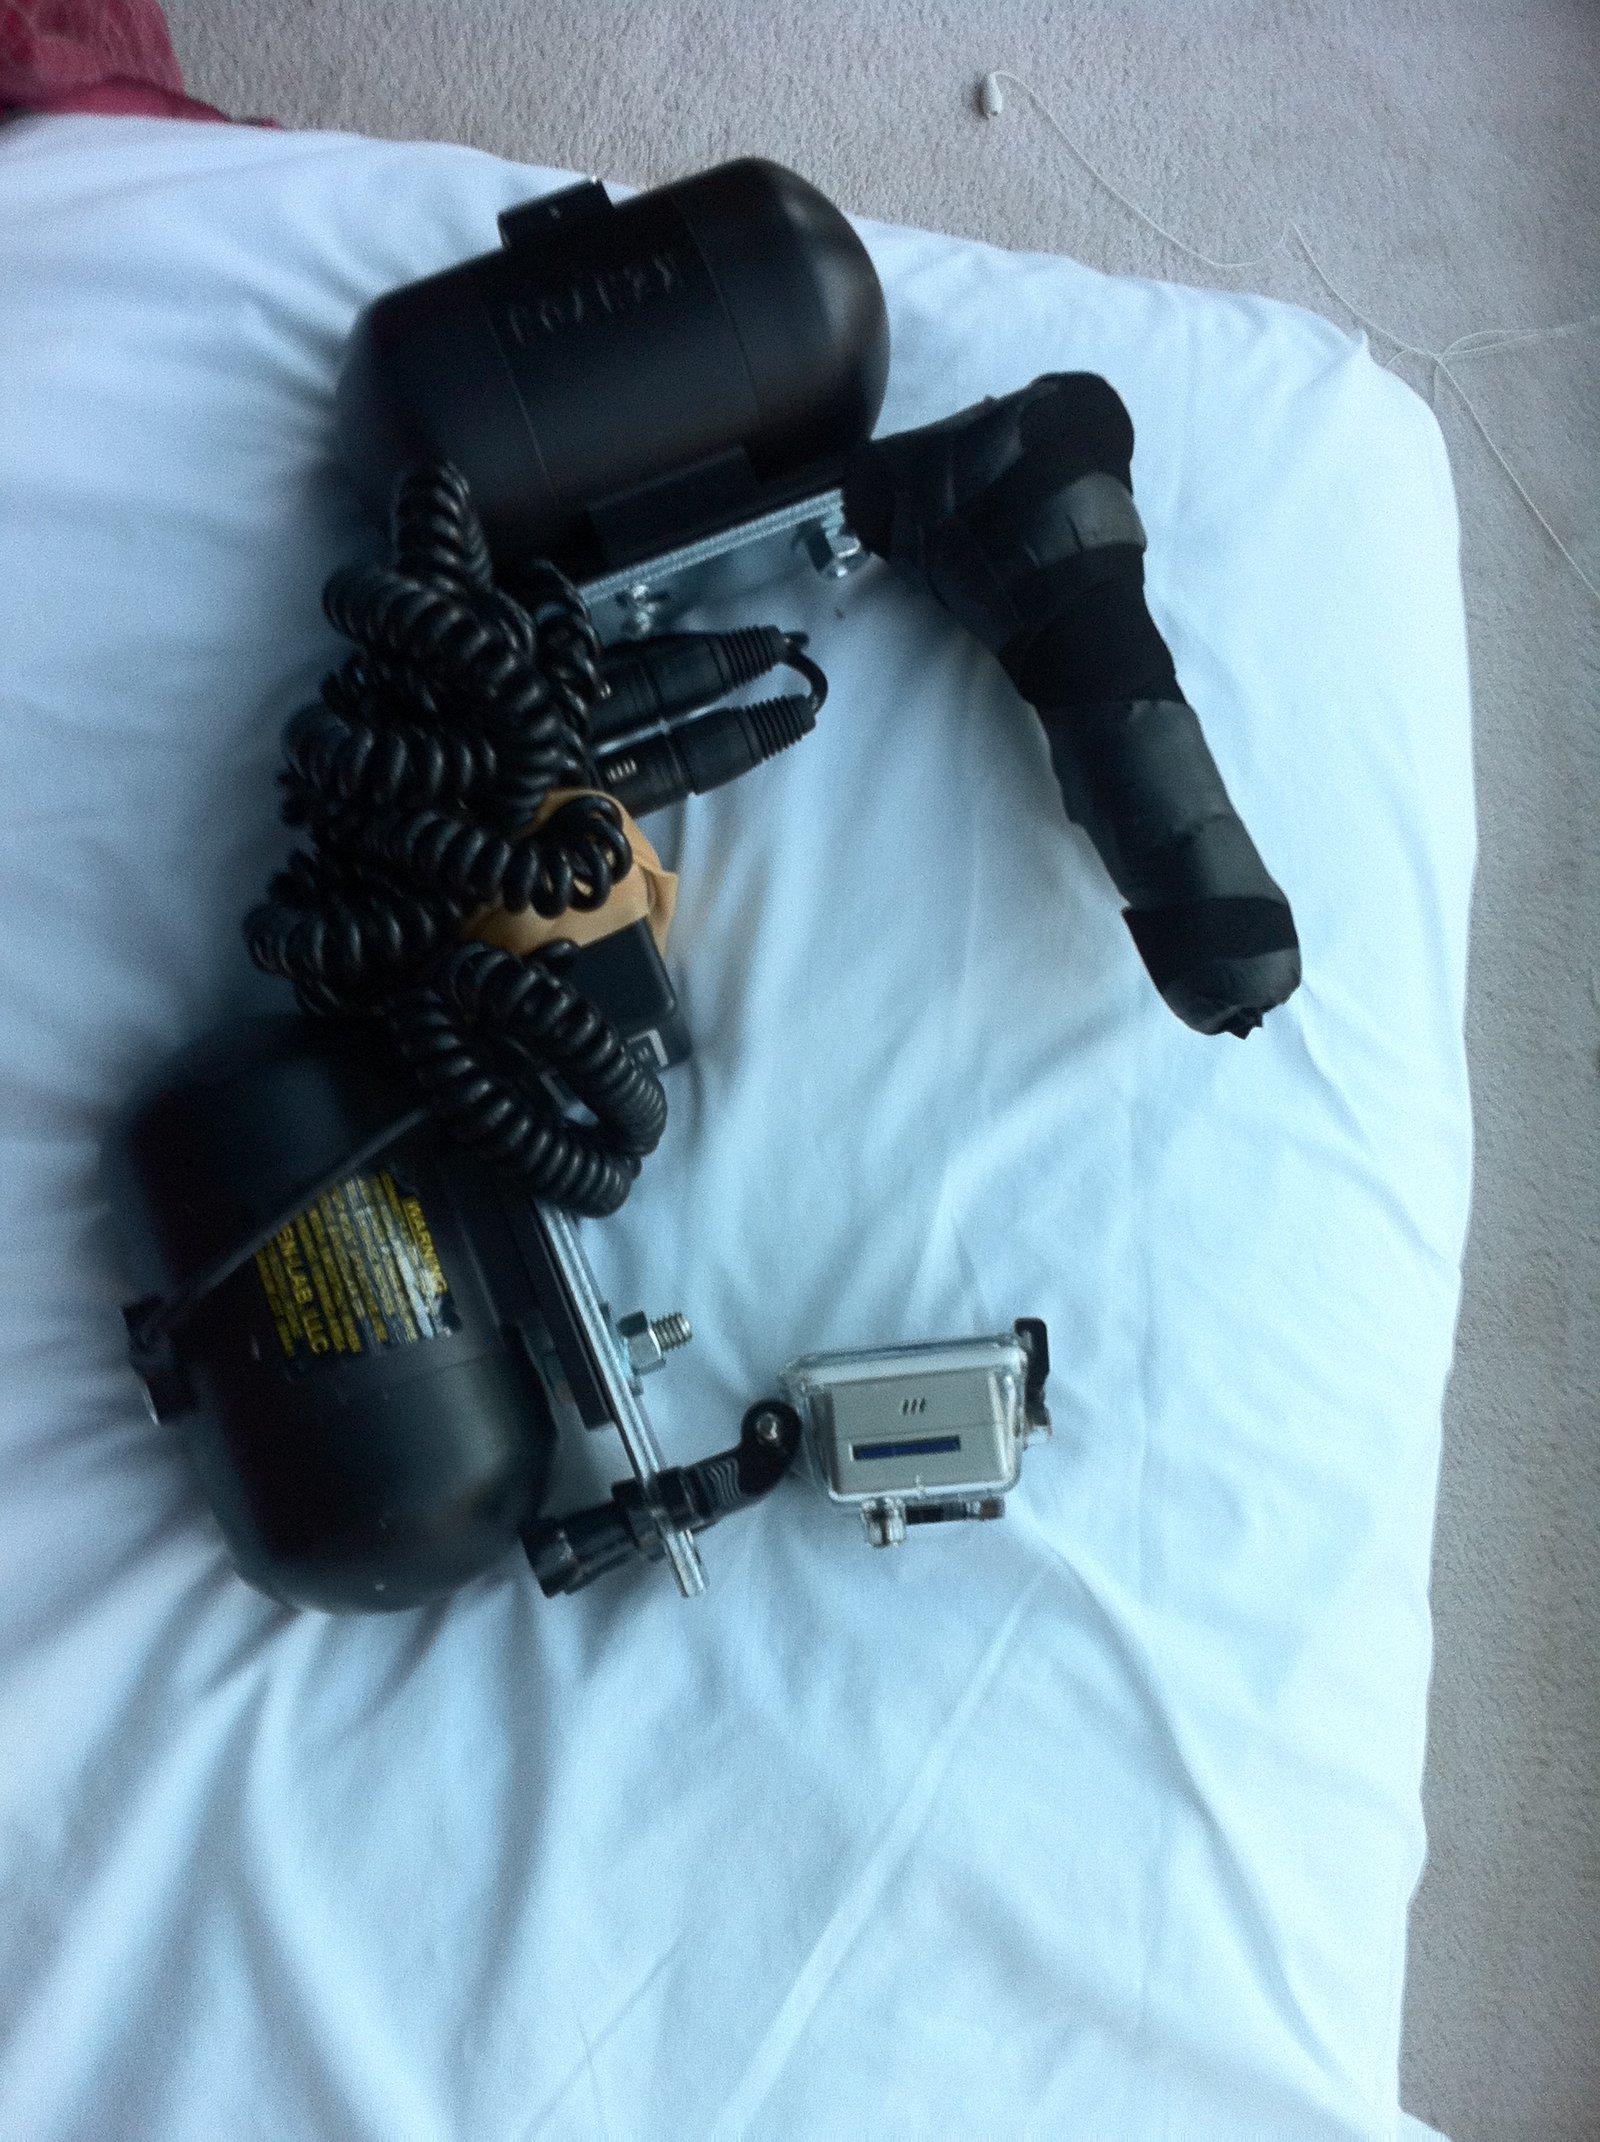 Gorpro, two giros, handle (battery goes in jacket)